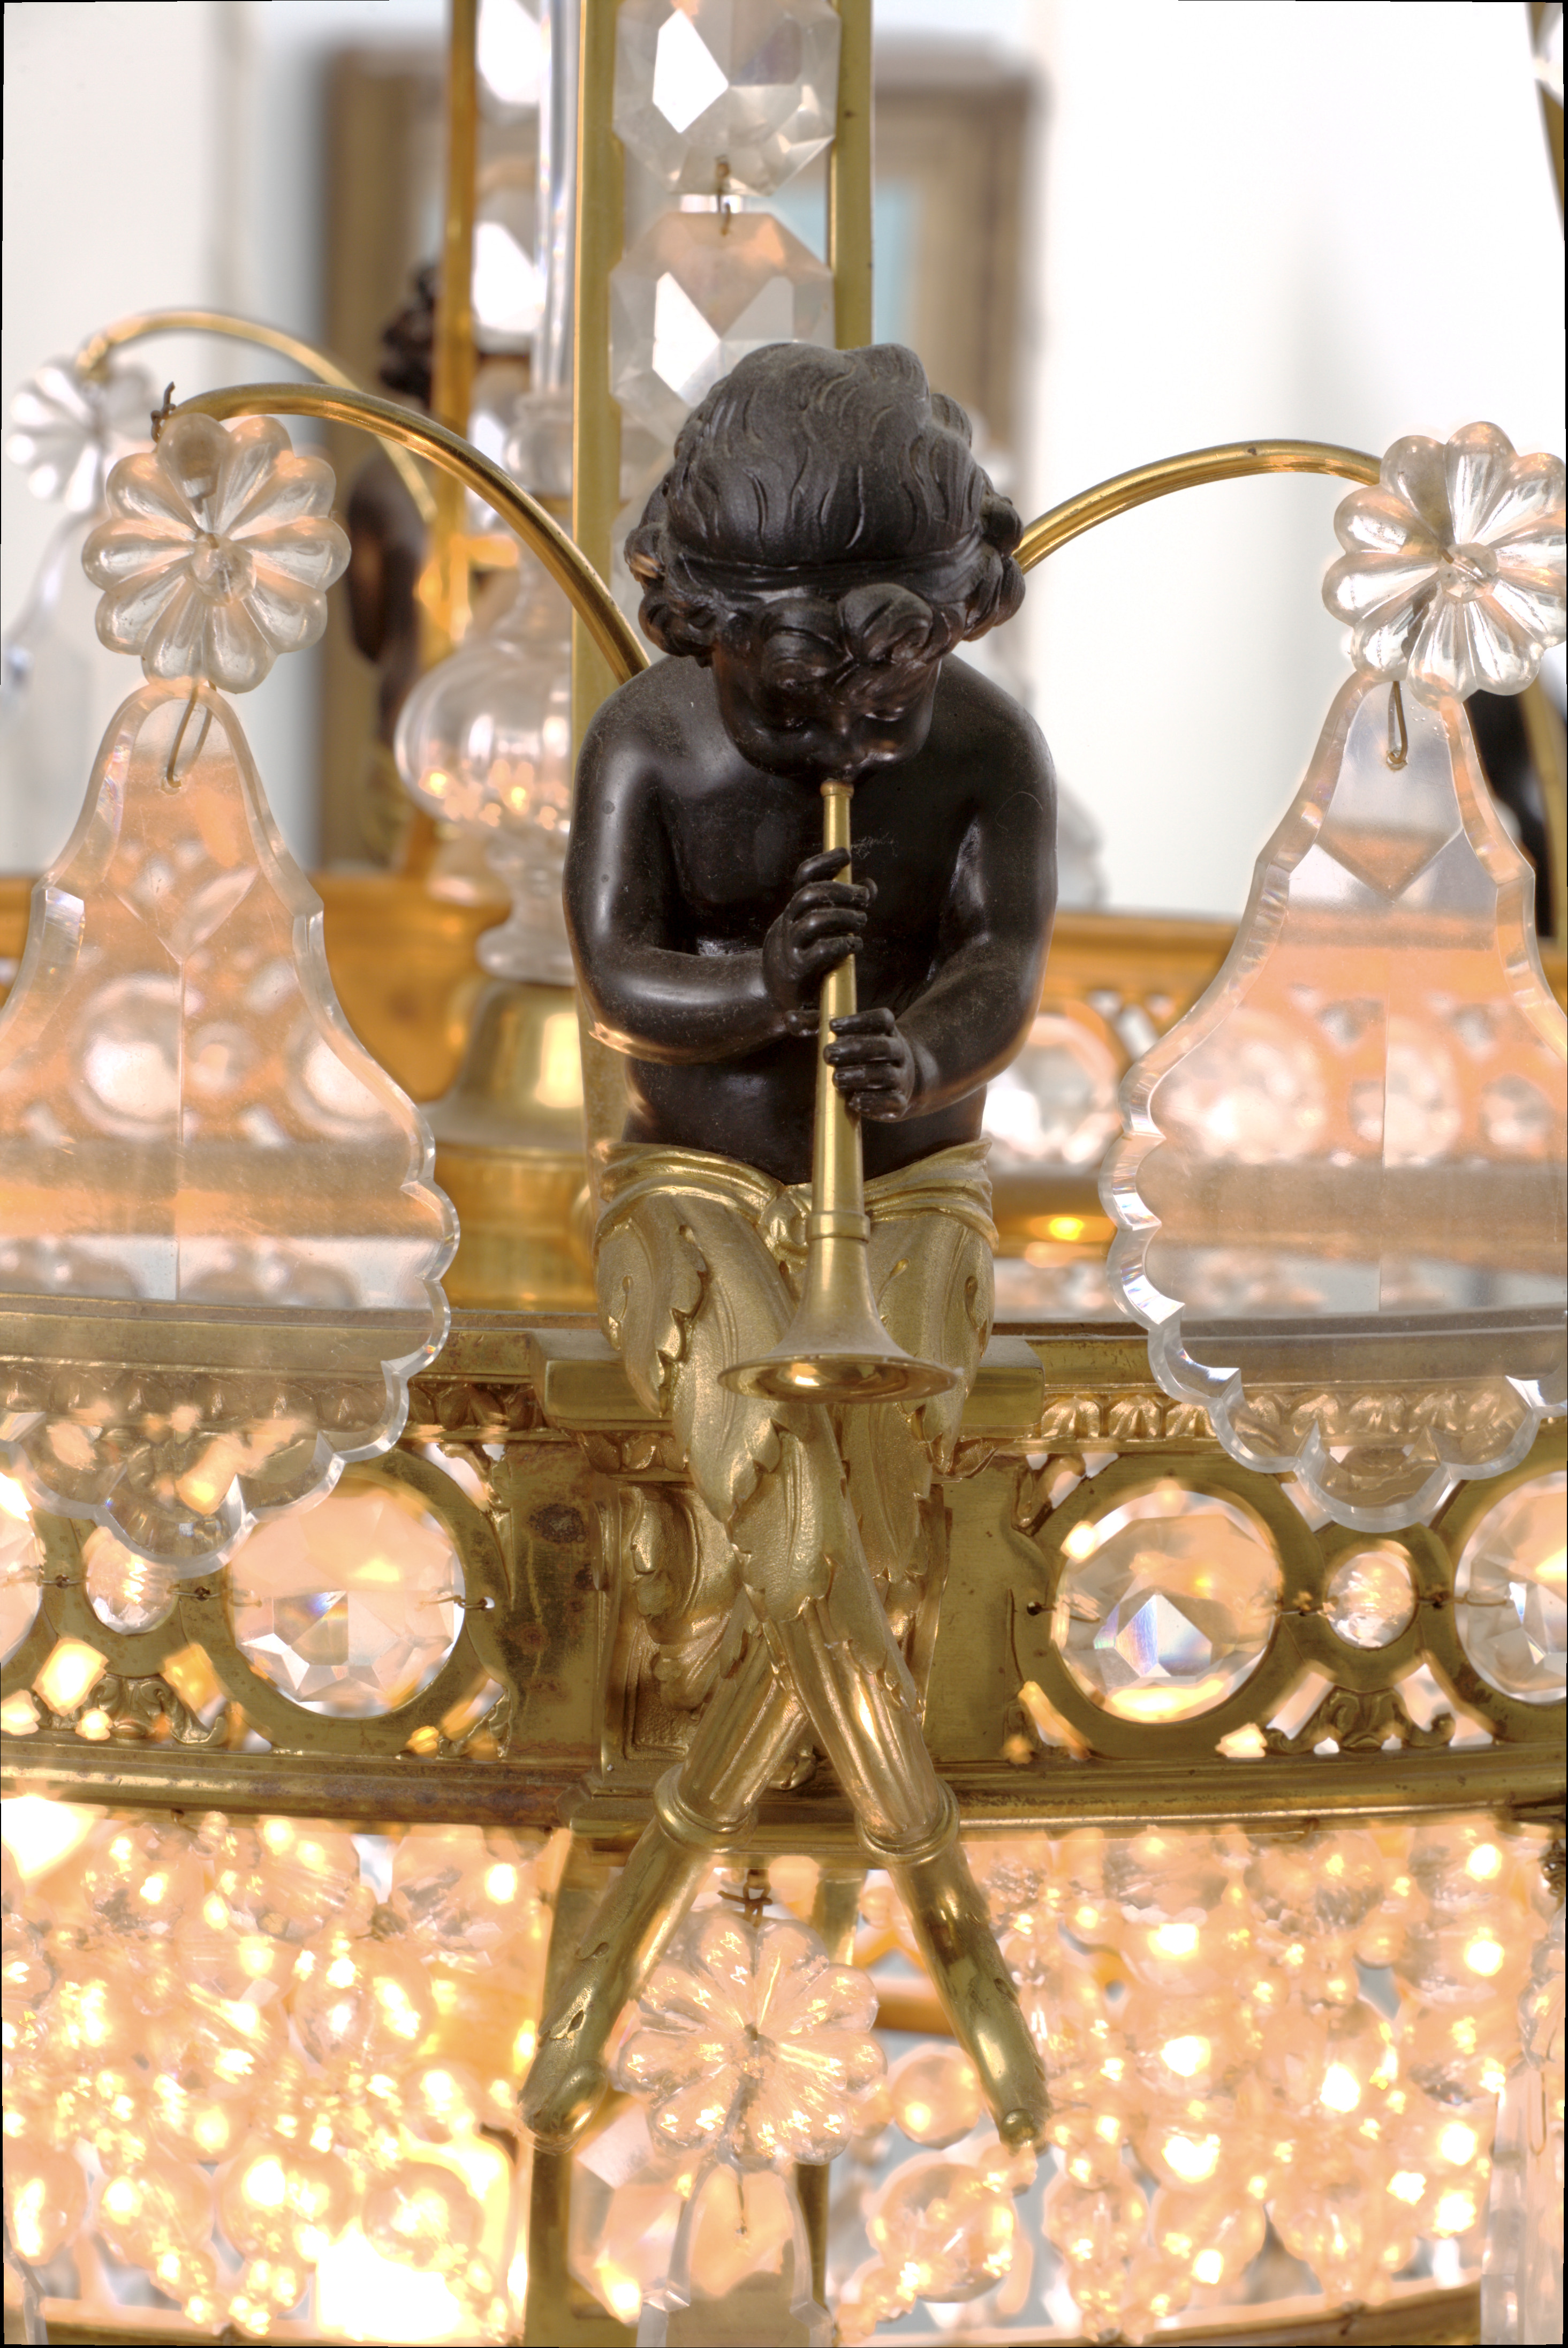 Chandalier Ornament